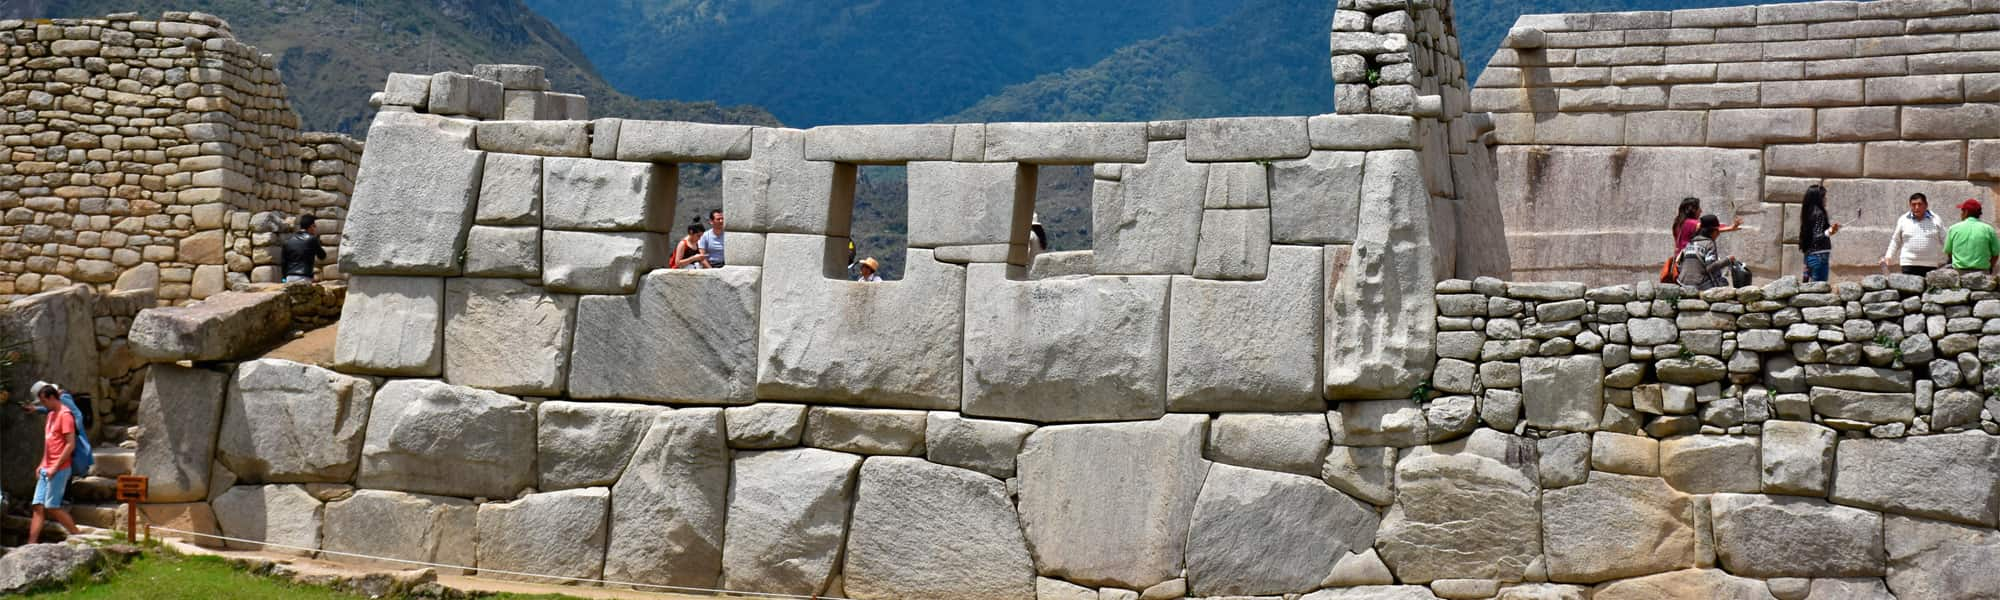 informations Machu Picchu - Sam travel